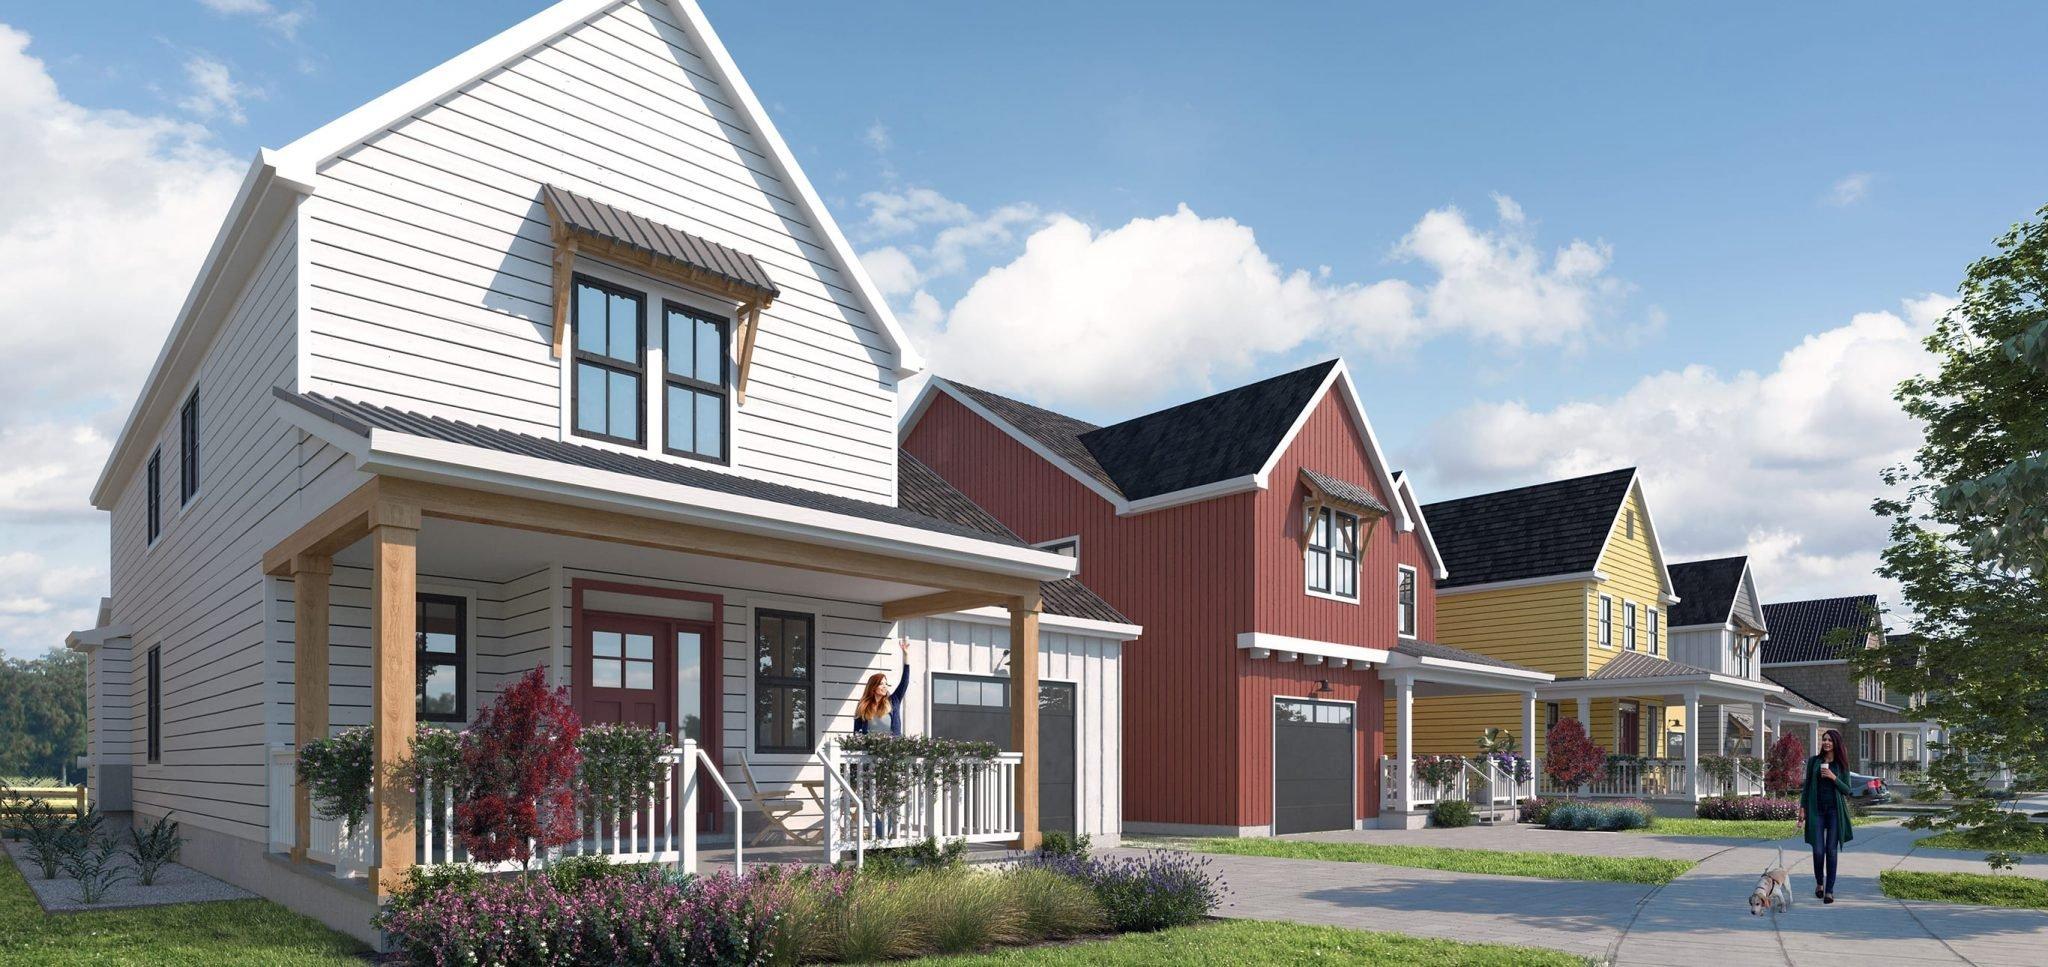 Southlands Estate Cottages - 256 Parkside St, Tsawwassen, BC V4L 0A9, Canada!